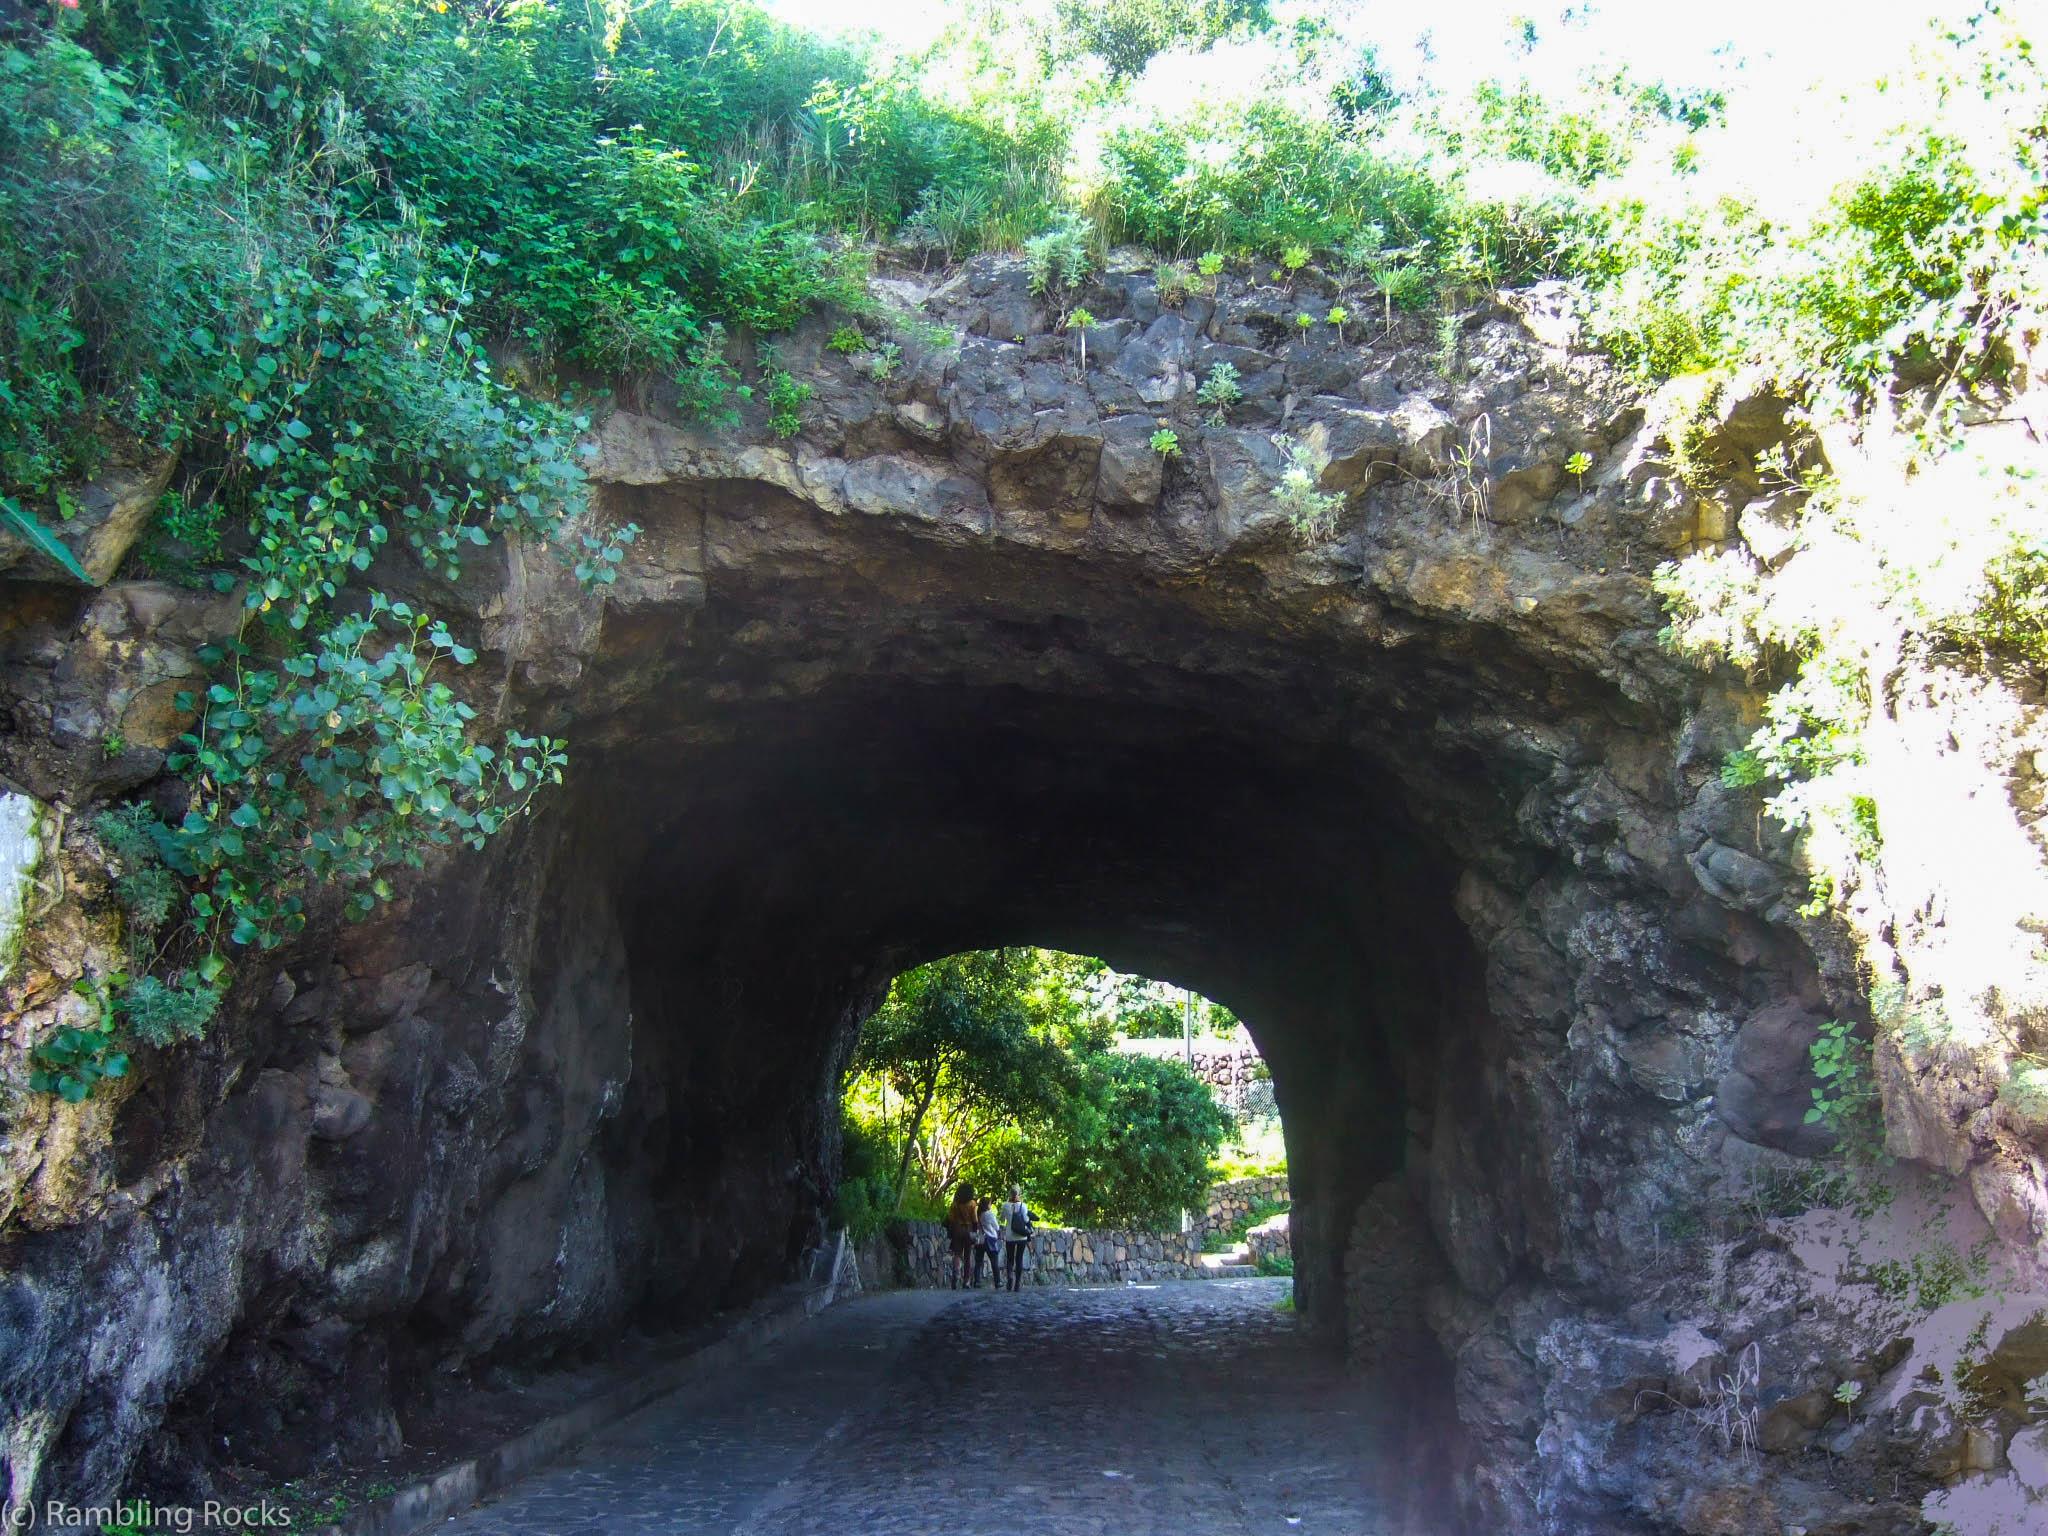 Vulkanhöhle Teneriffa